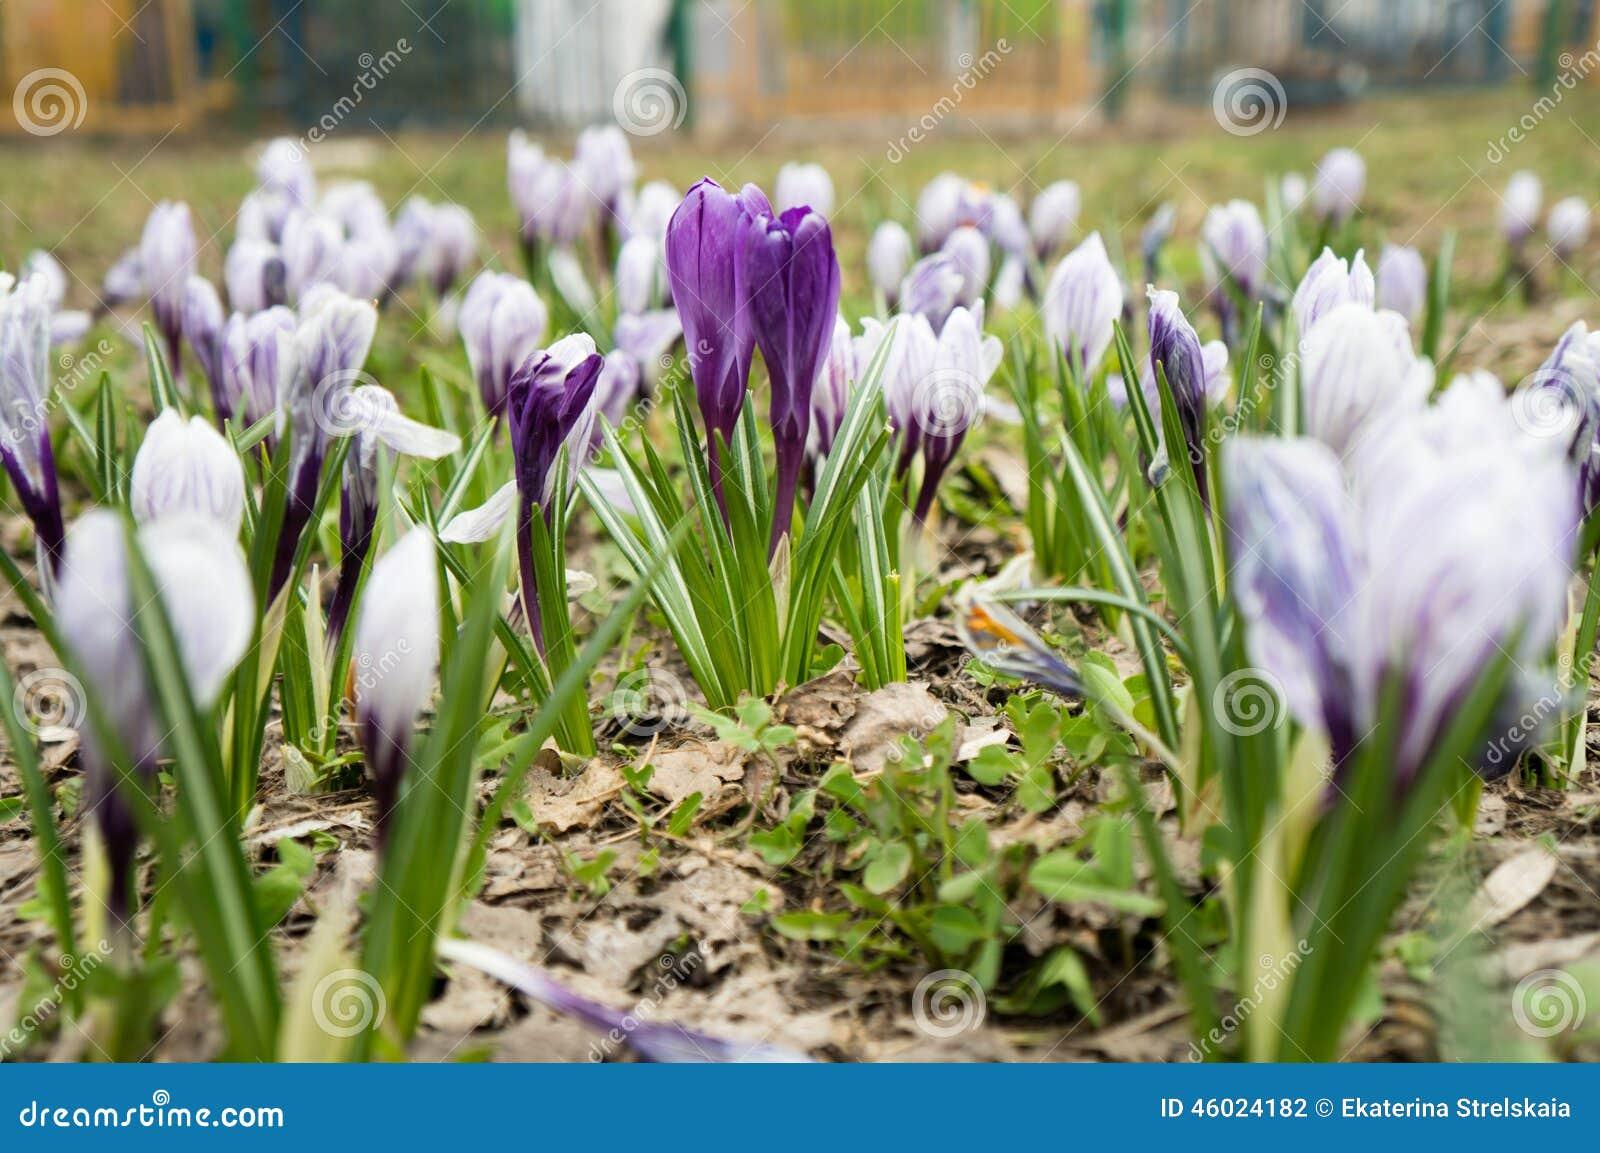 Fleurs De Crocus Pourpre Perce Neige Photo Stock Image Du